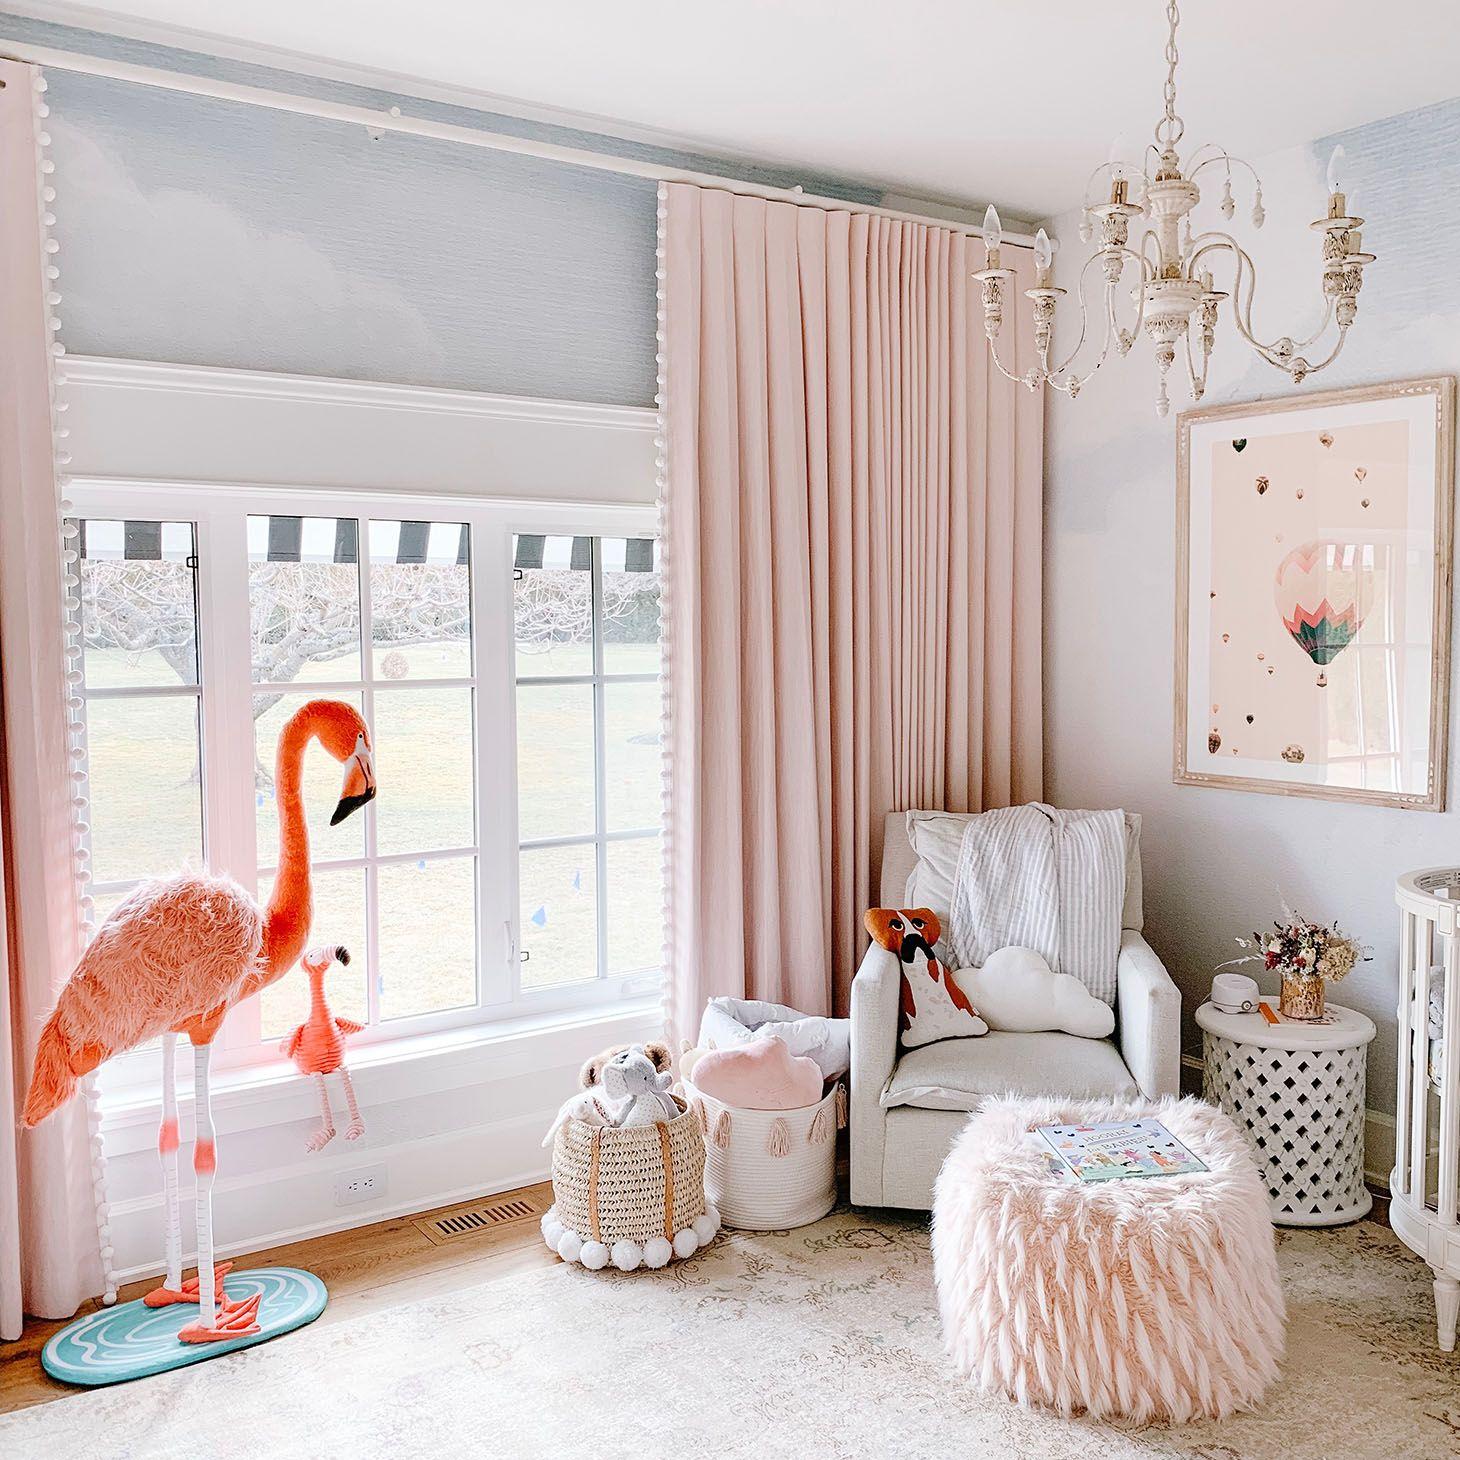 Home Tour Series: Annie's Dreamy Nursery